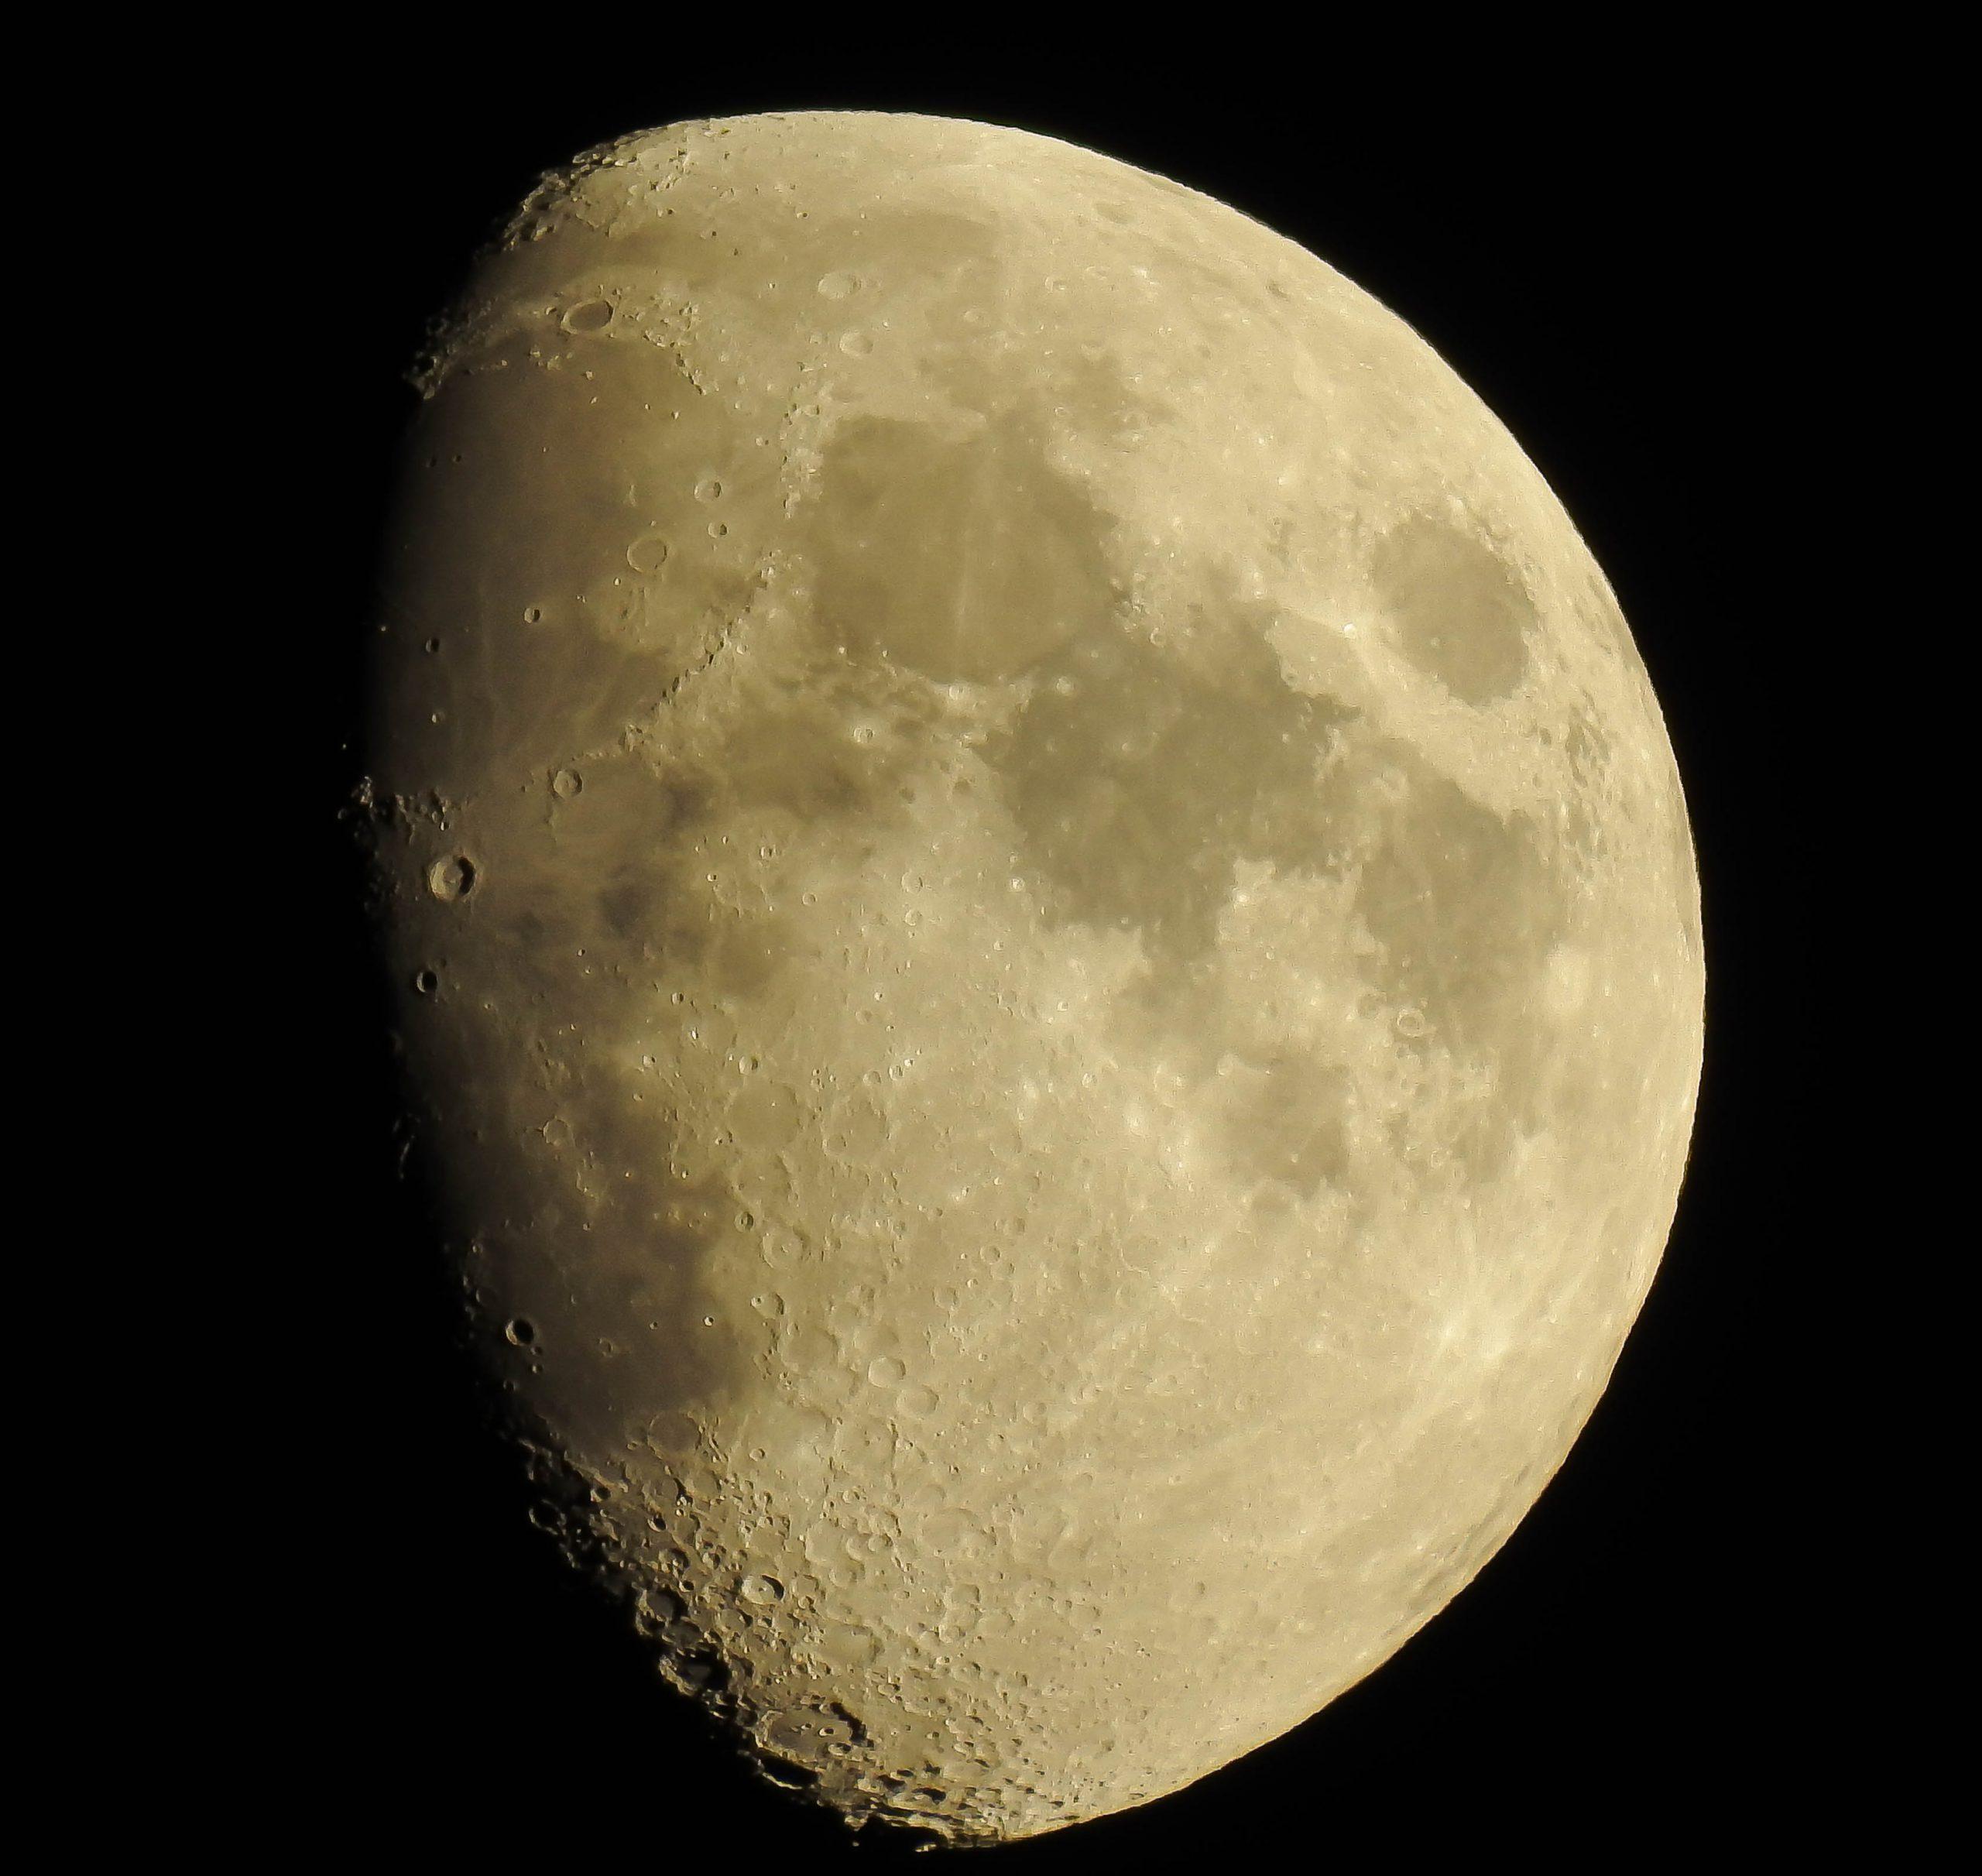 La Luna Hoy